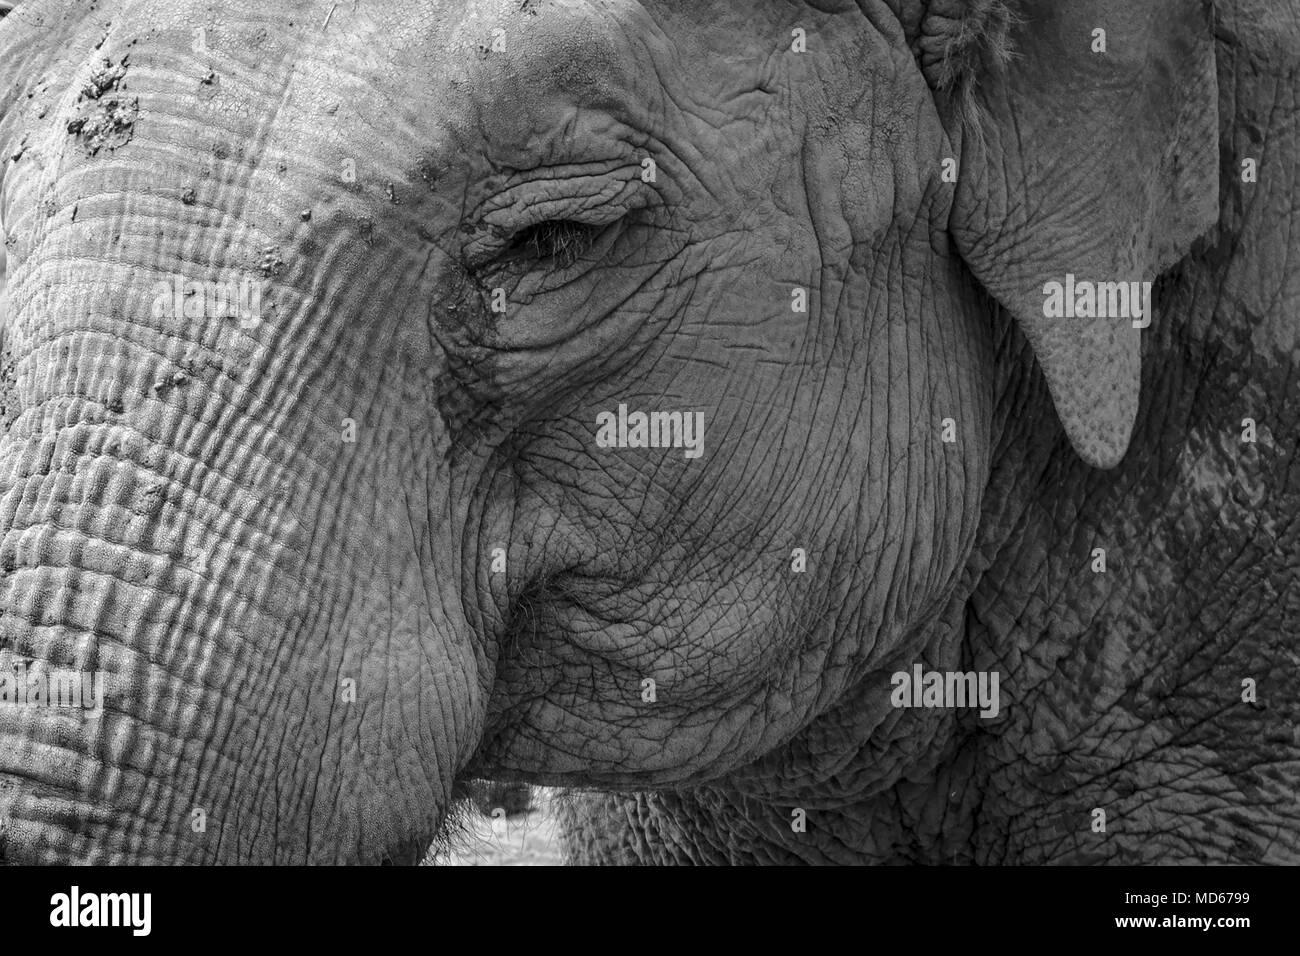 Noir blanc éléphant au zoo Photo Stock